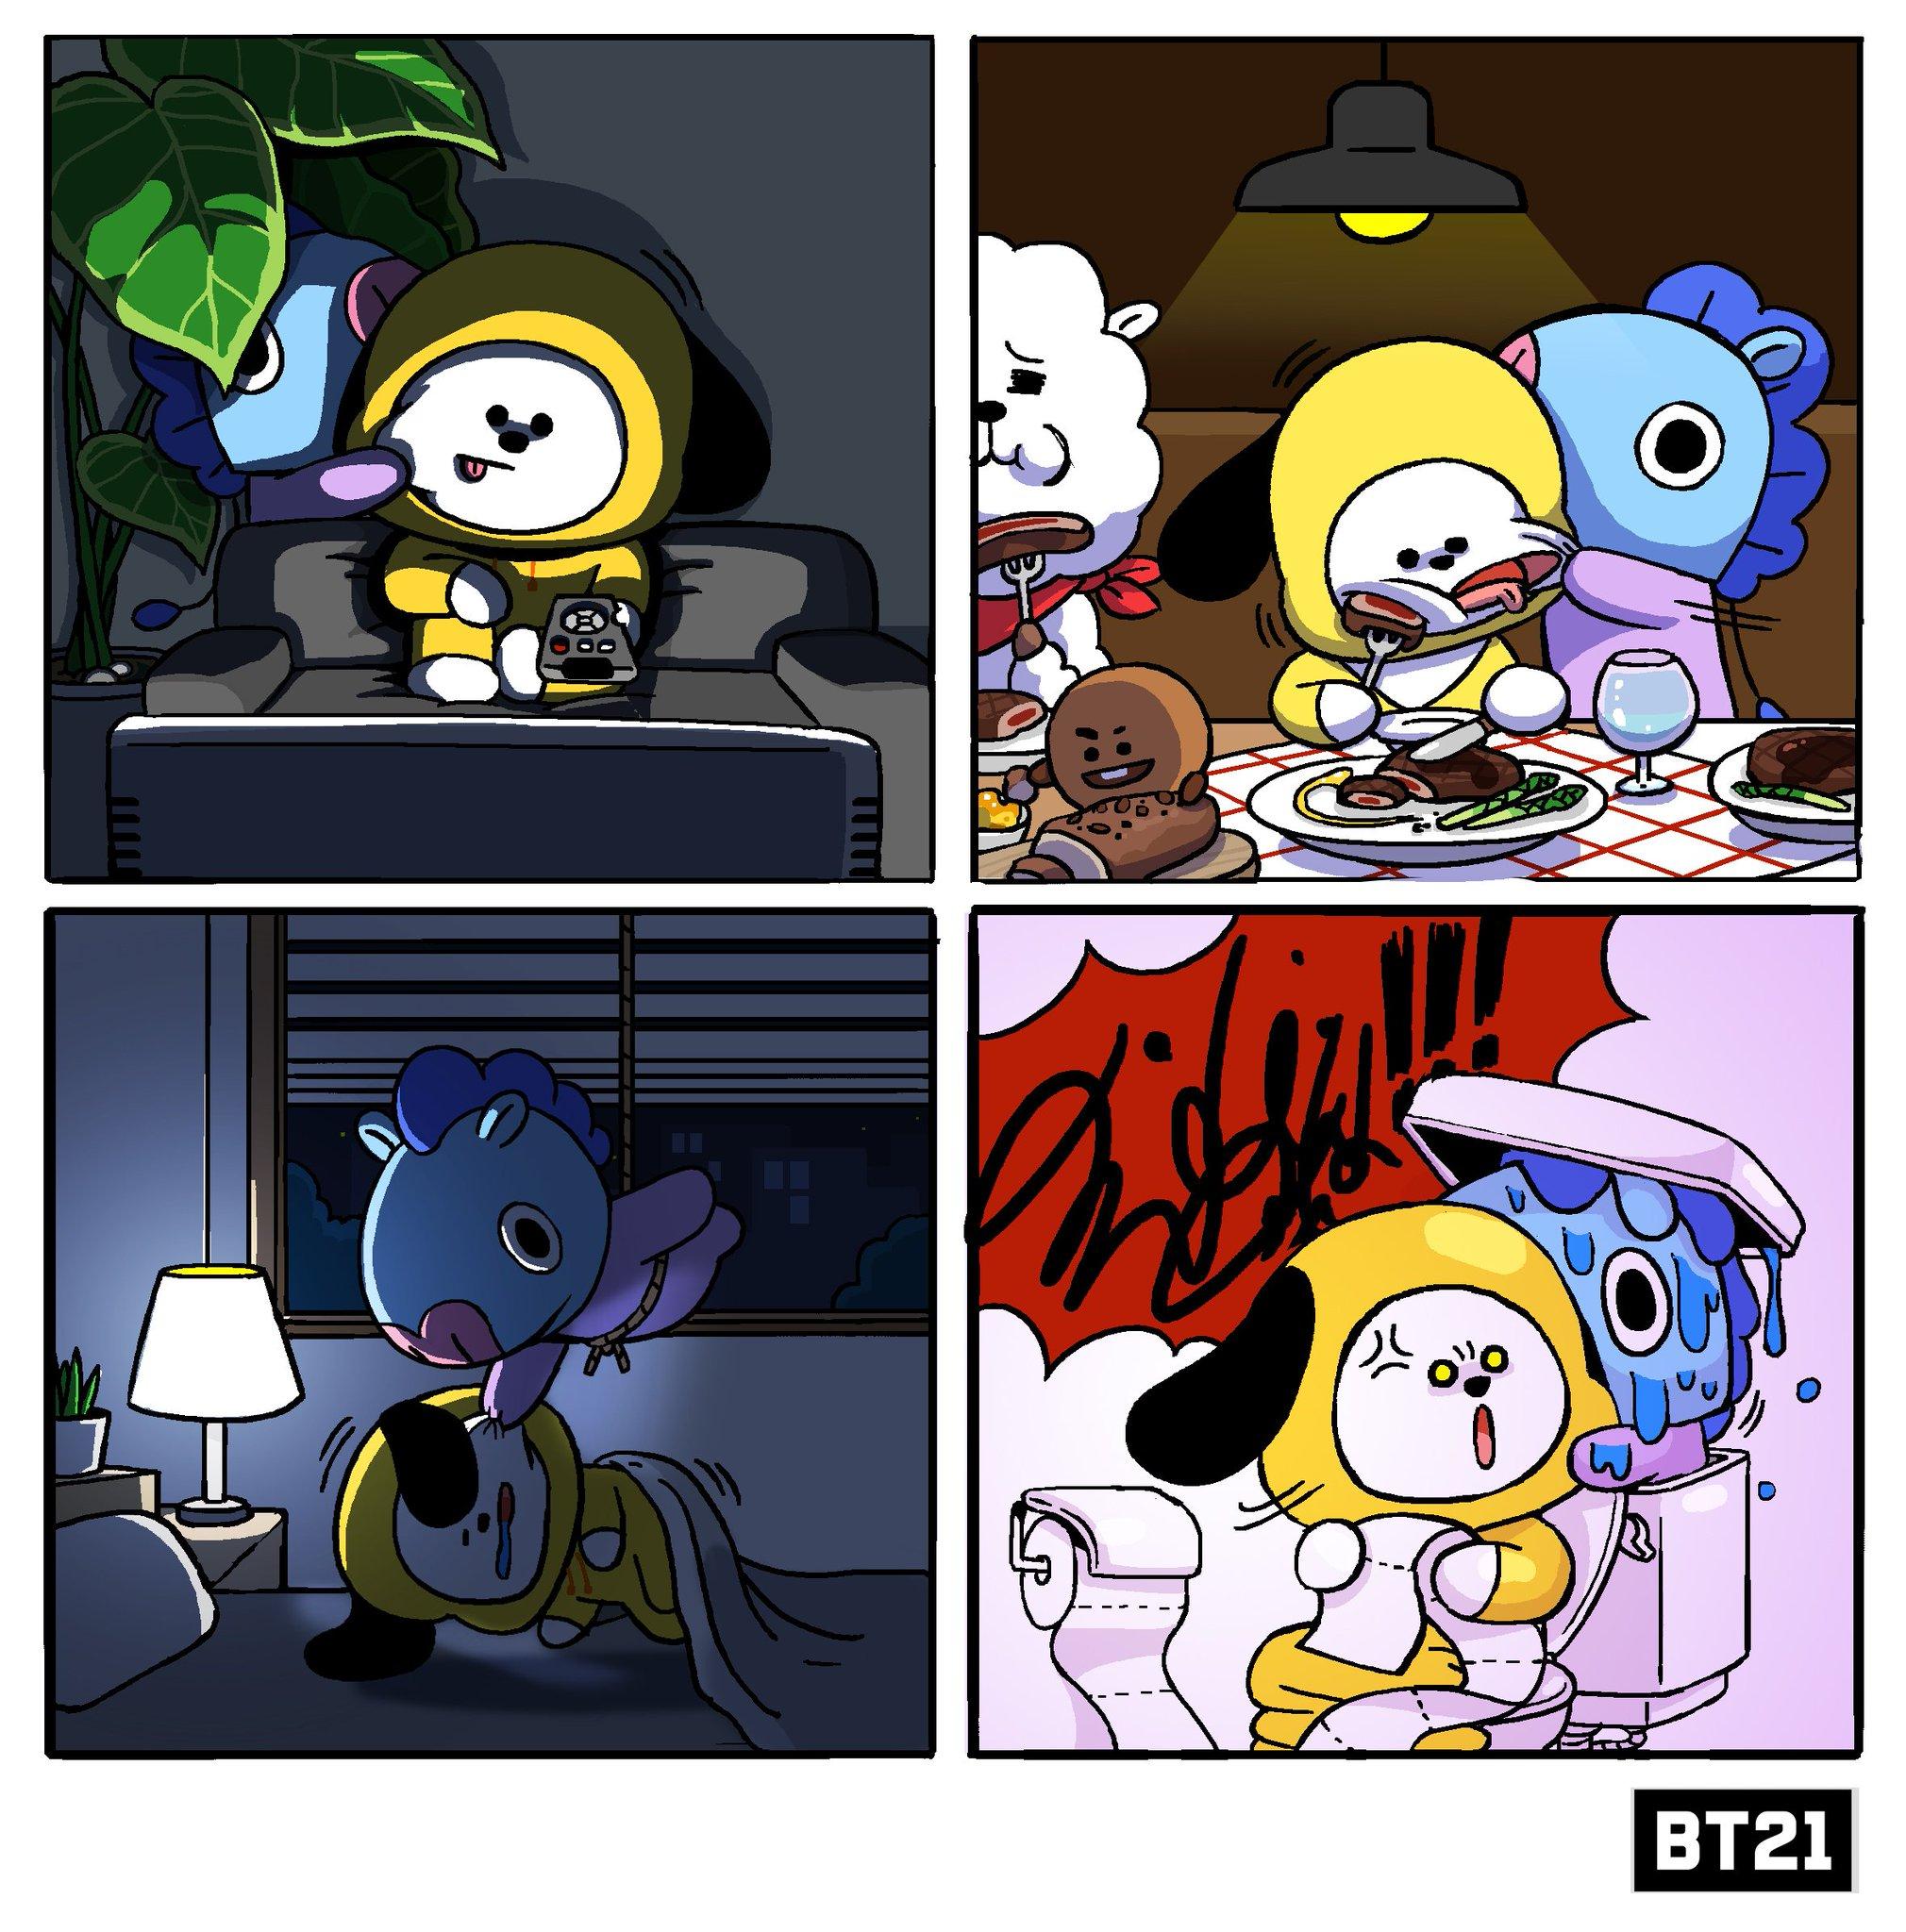 Cute Bts Drawings Wallpaper Bt21 On Twitter Quot Mang Loves Chimmy S Cheek